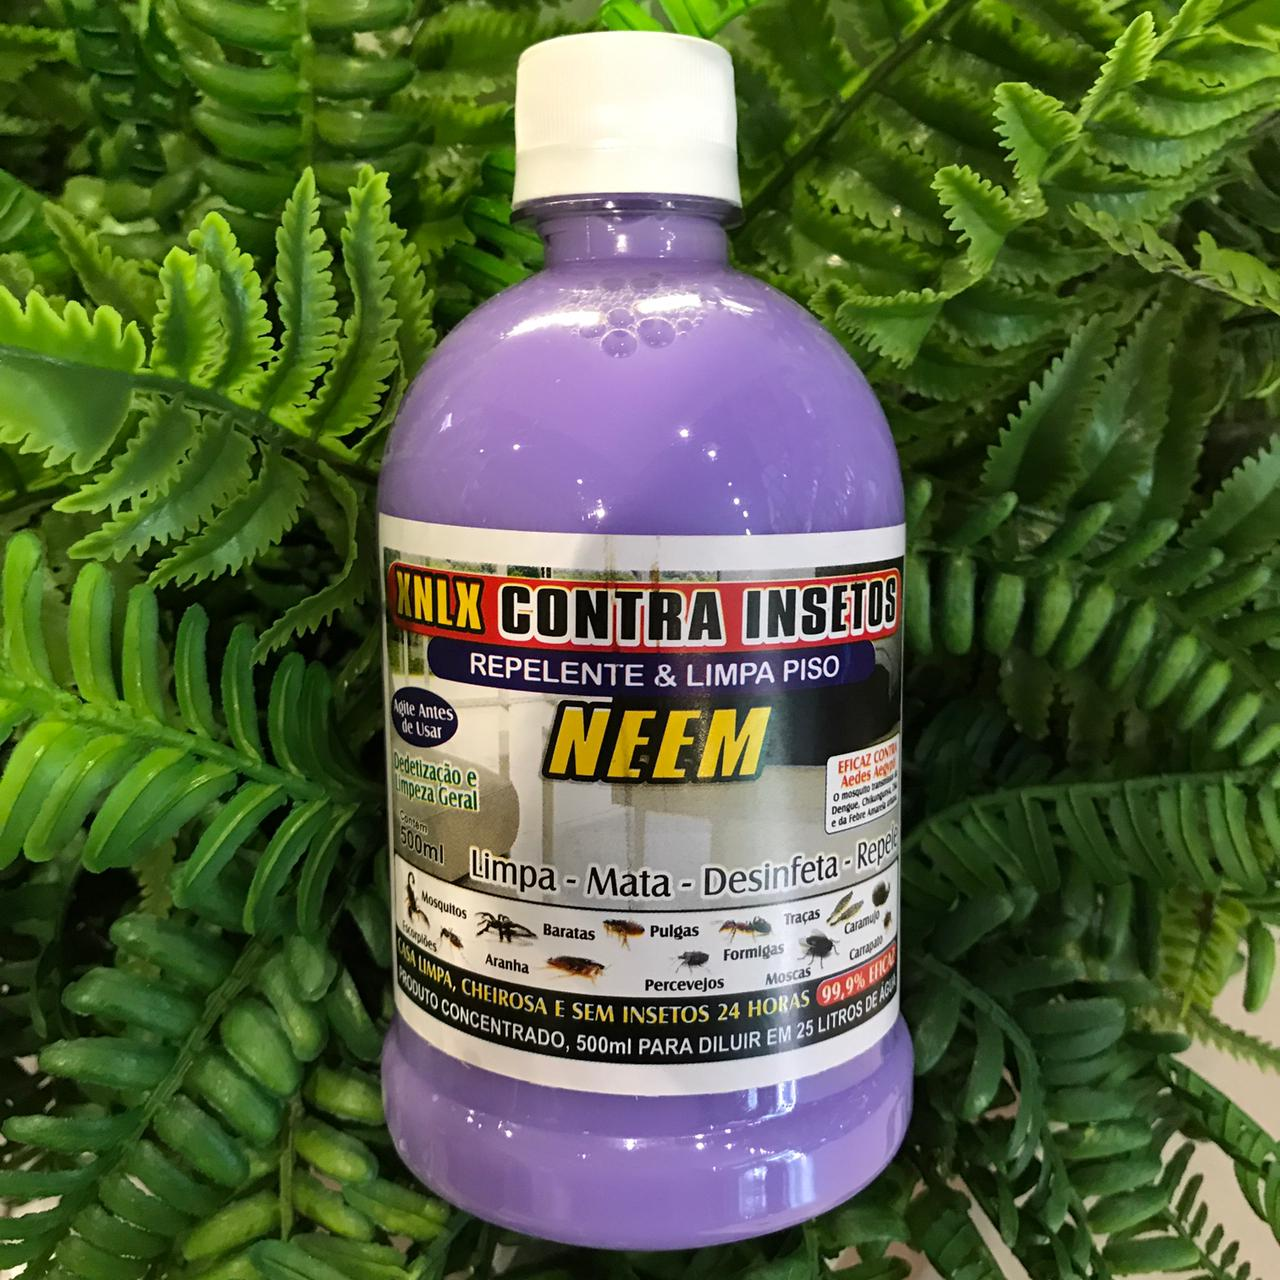 Repelente e Limpa Piso Contra Insetos Repele, Desinfeta e Limpa 500g